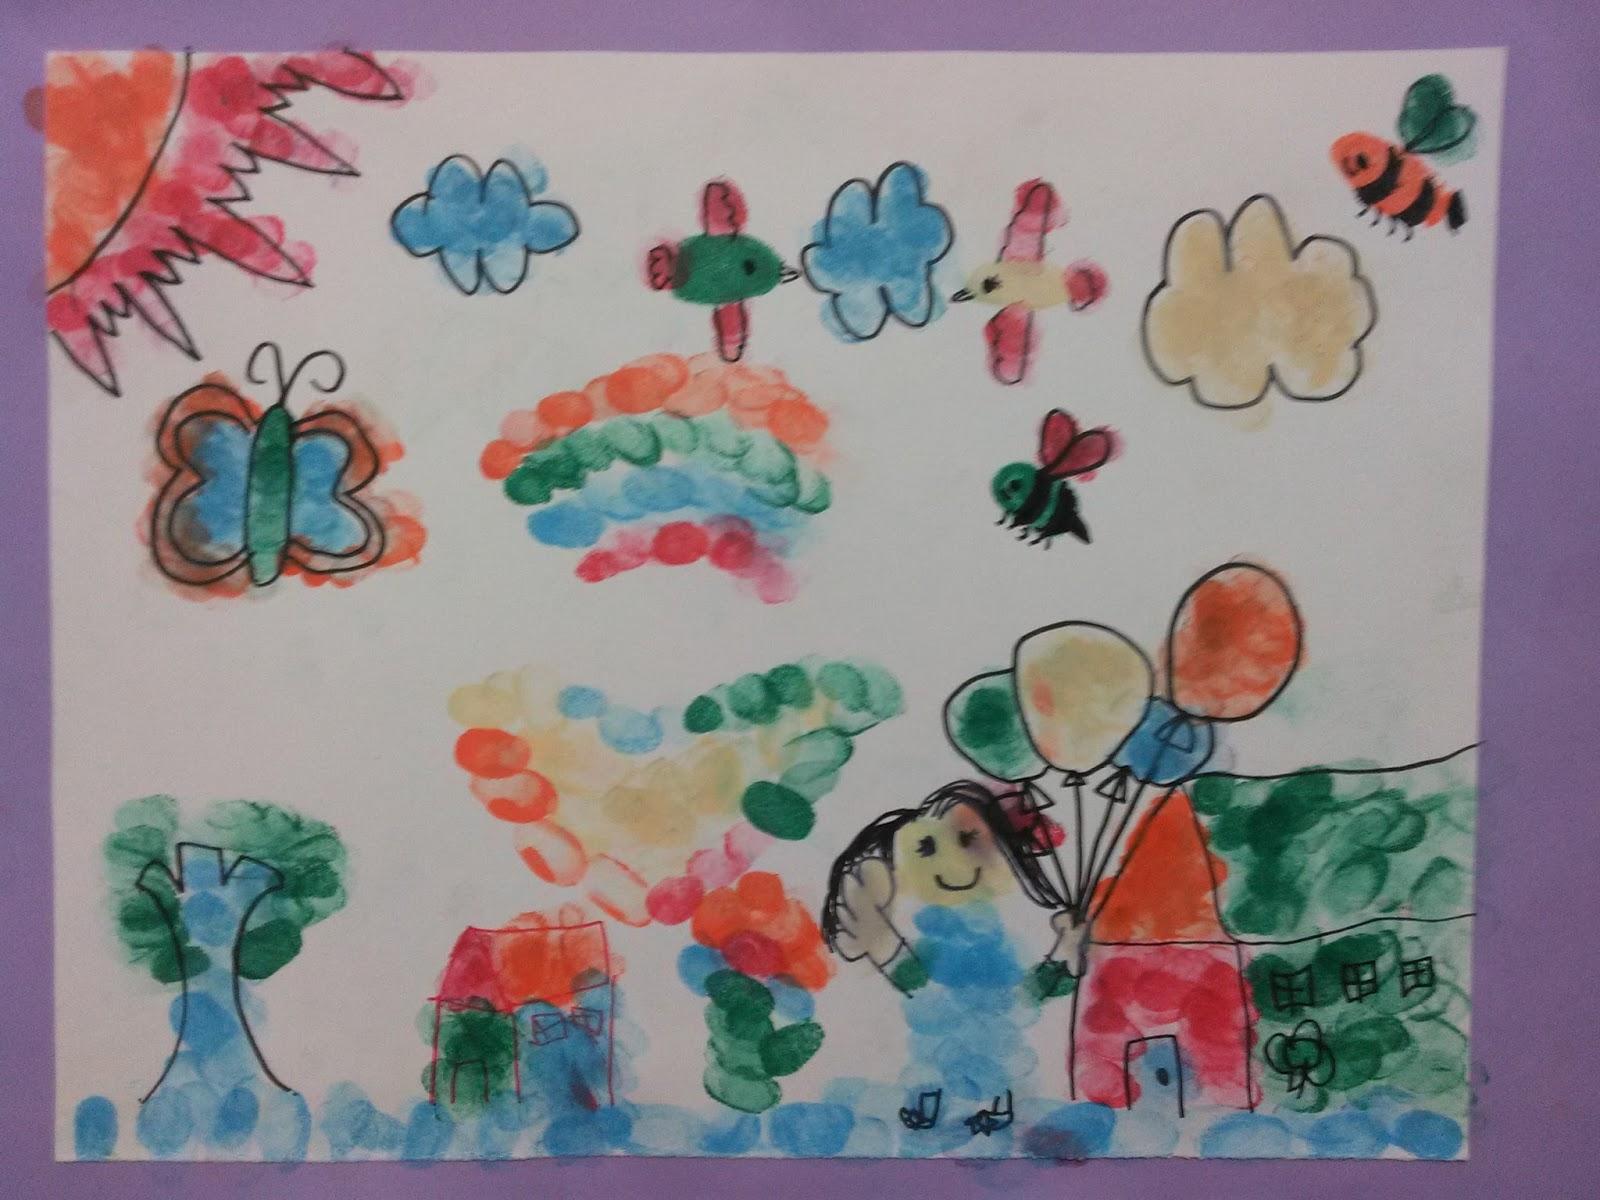 Tantangannya ada pada kemampuan anak2 untuk fokus pada sebuah tema mengembangkan cerita sambil berimajinasi dalam mengubah sebuah cap jari menjadi bentuk